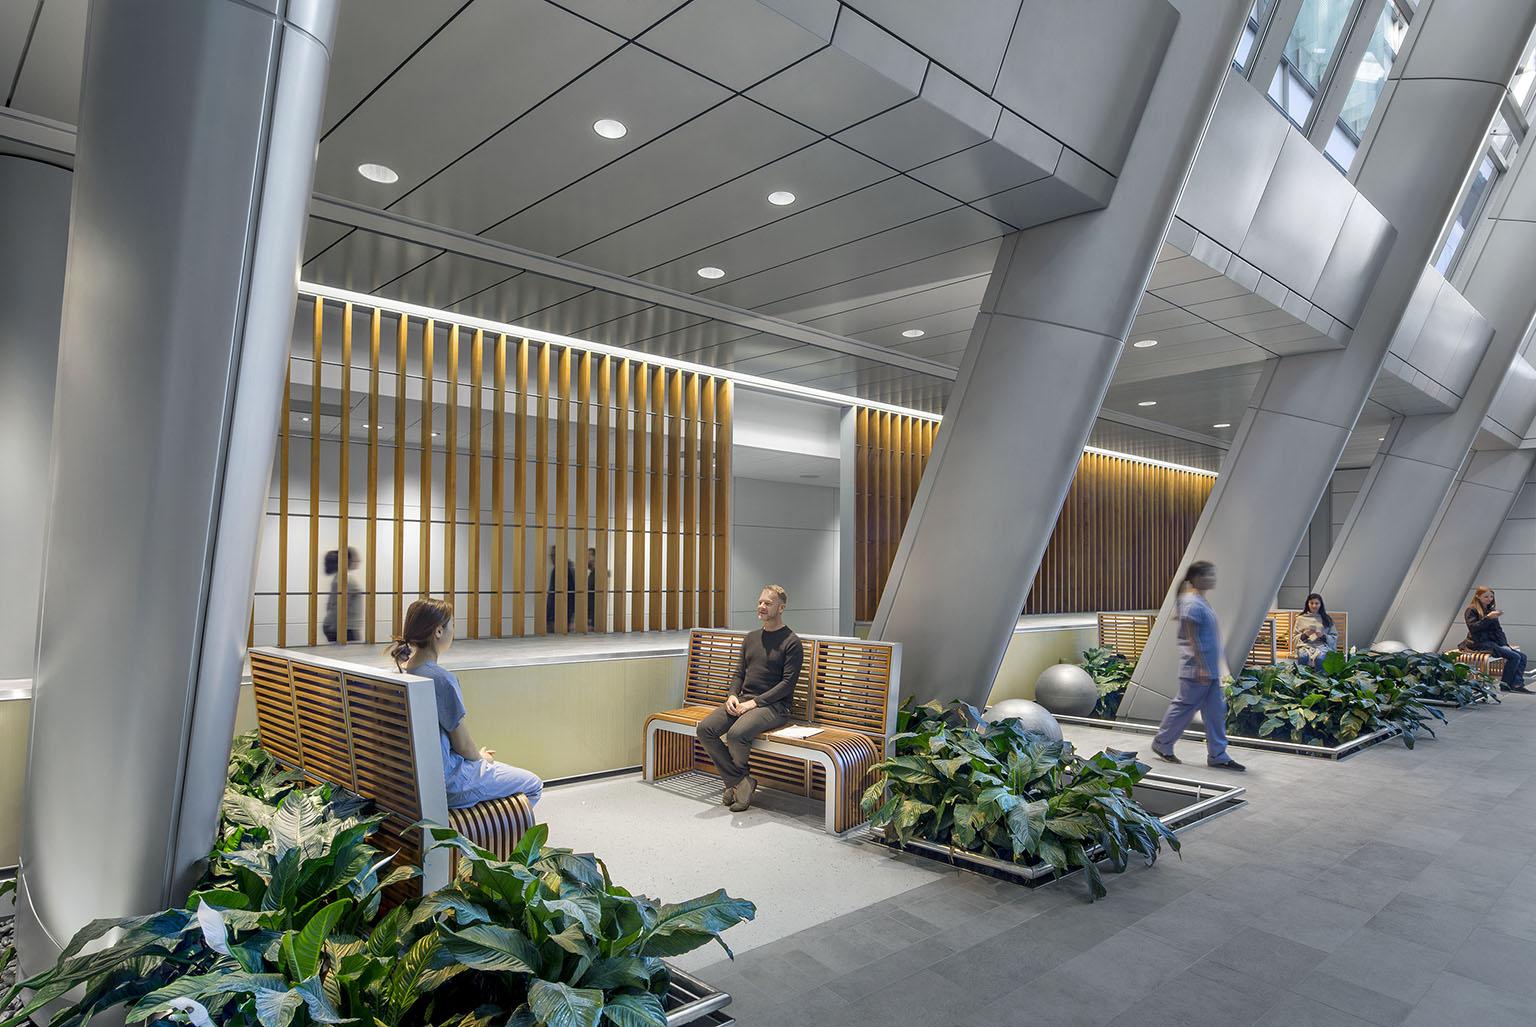 Santa Clara Valley Patient Bed Building I and Rehabilitation Center